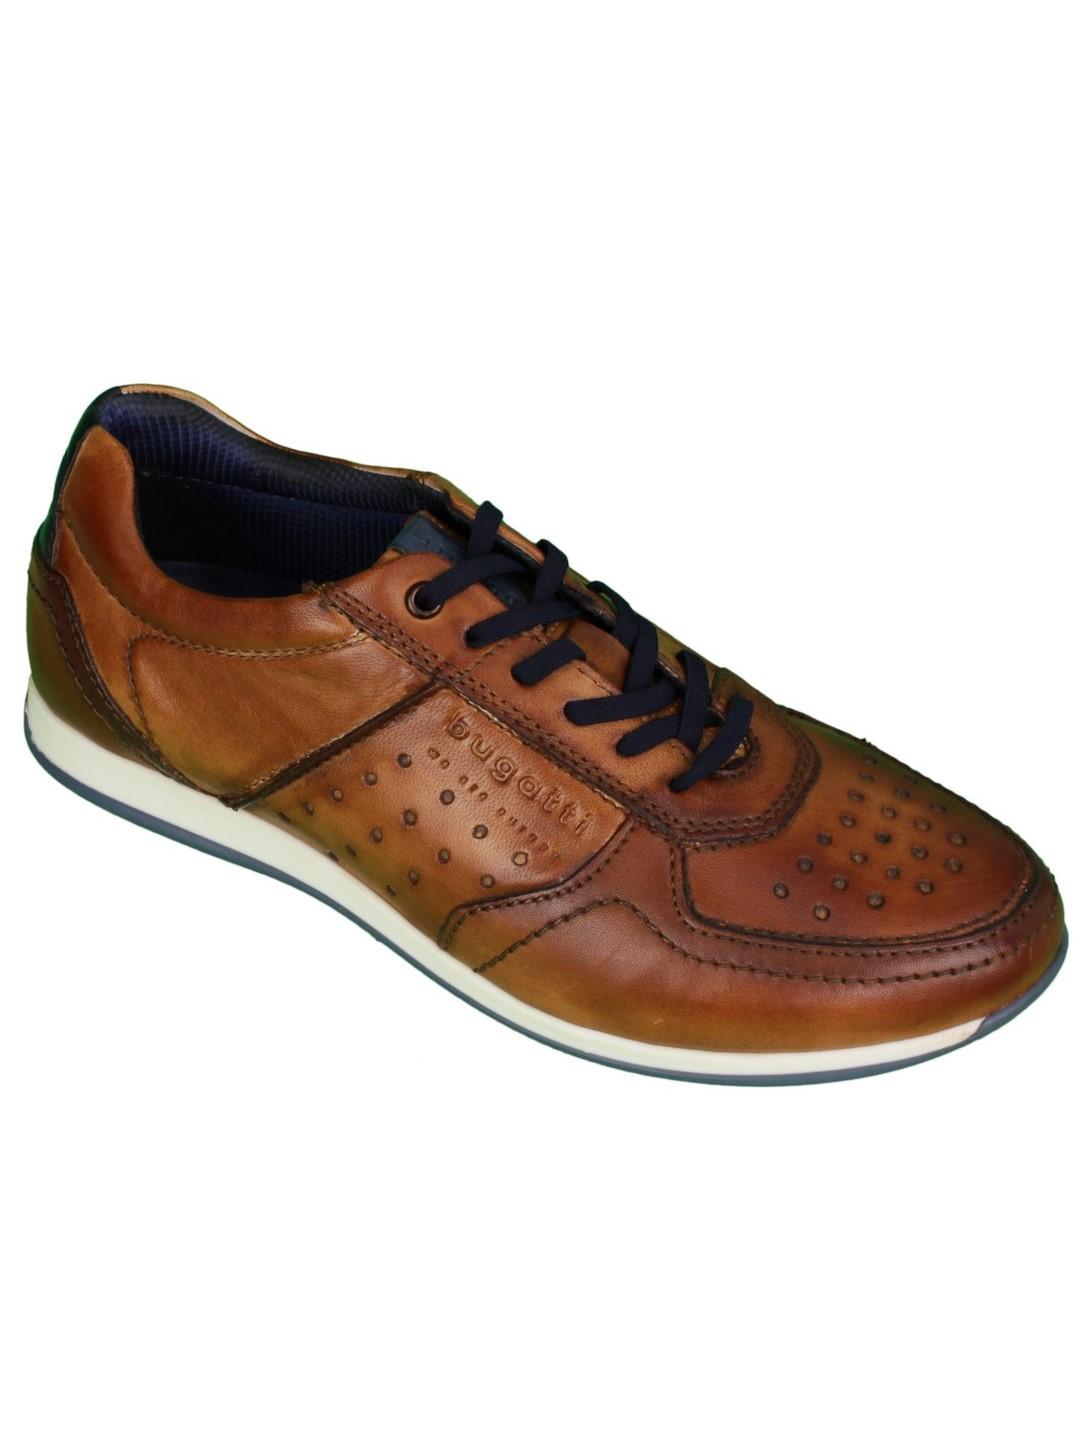 Bugatti Herren Schuhe Sneaker braun 311 45007 3500 6300 cognac